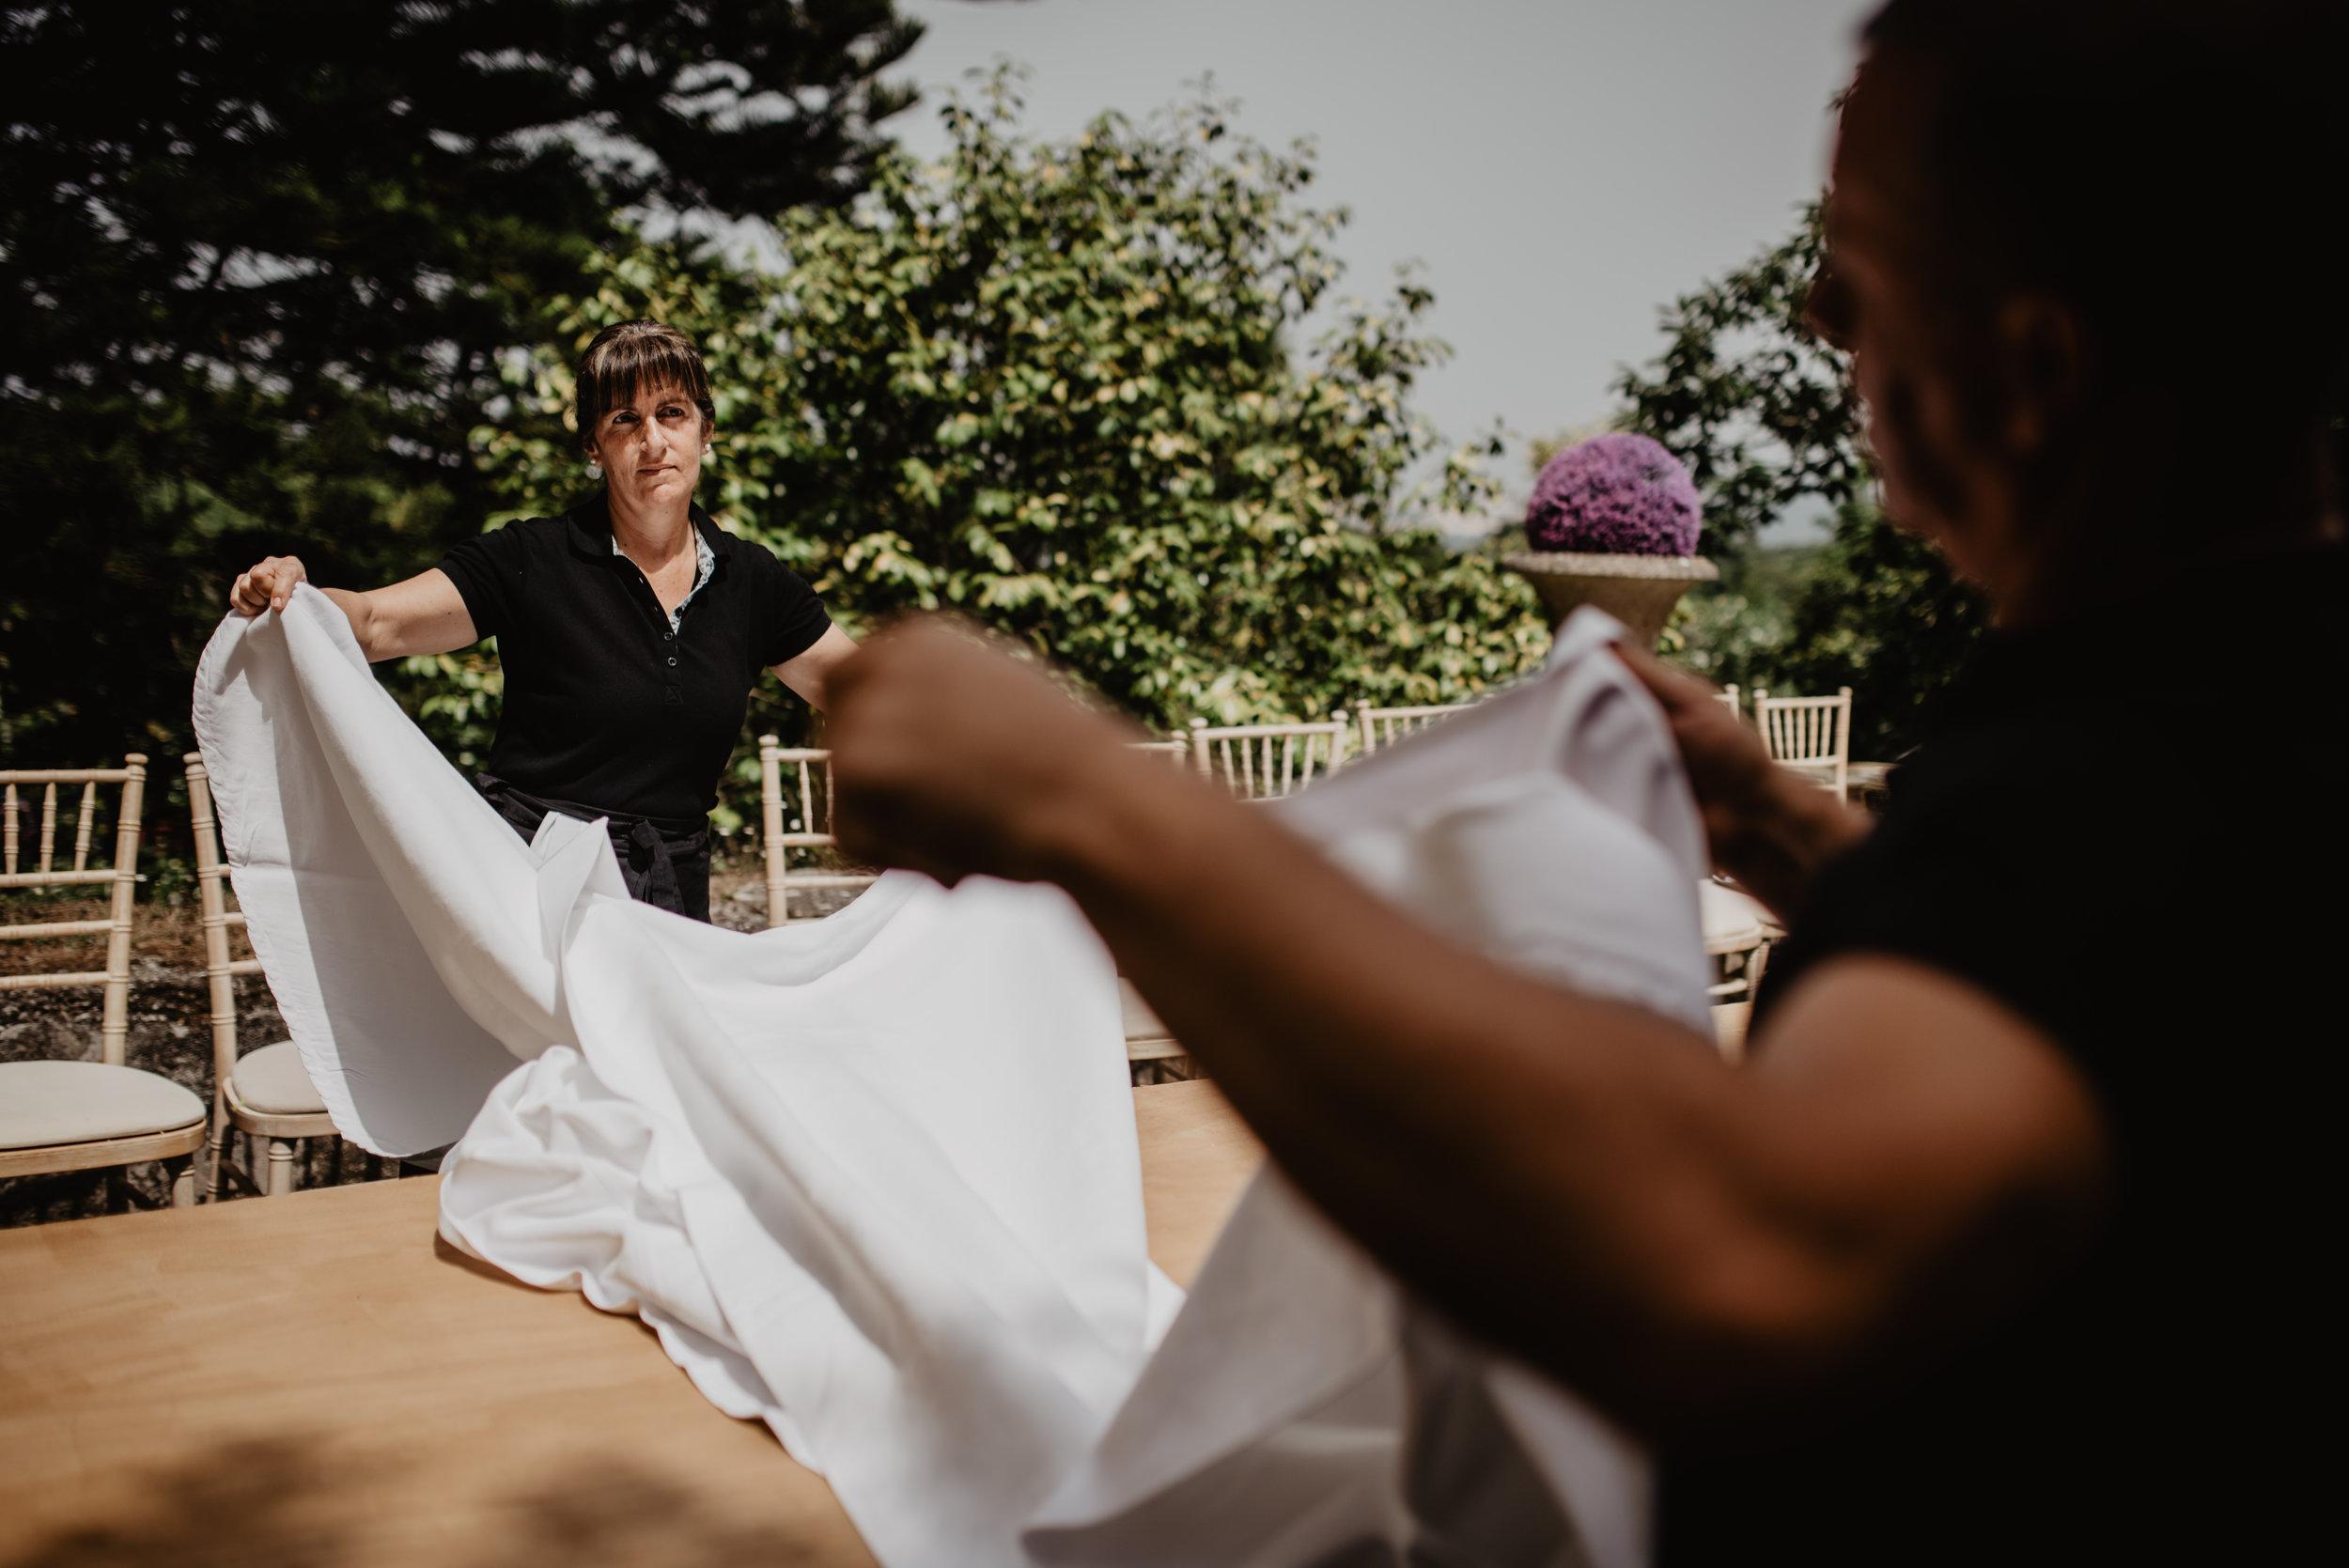 Lapela-photography-wedding-sintra-portugal-14.jpg